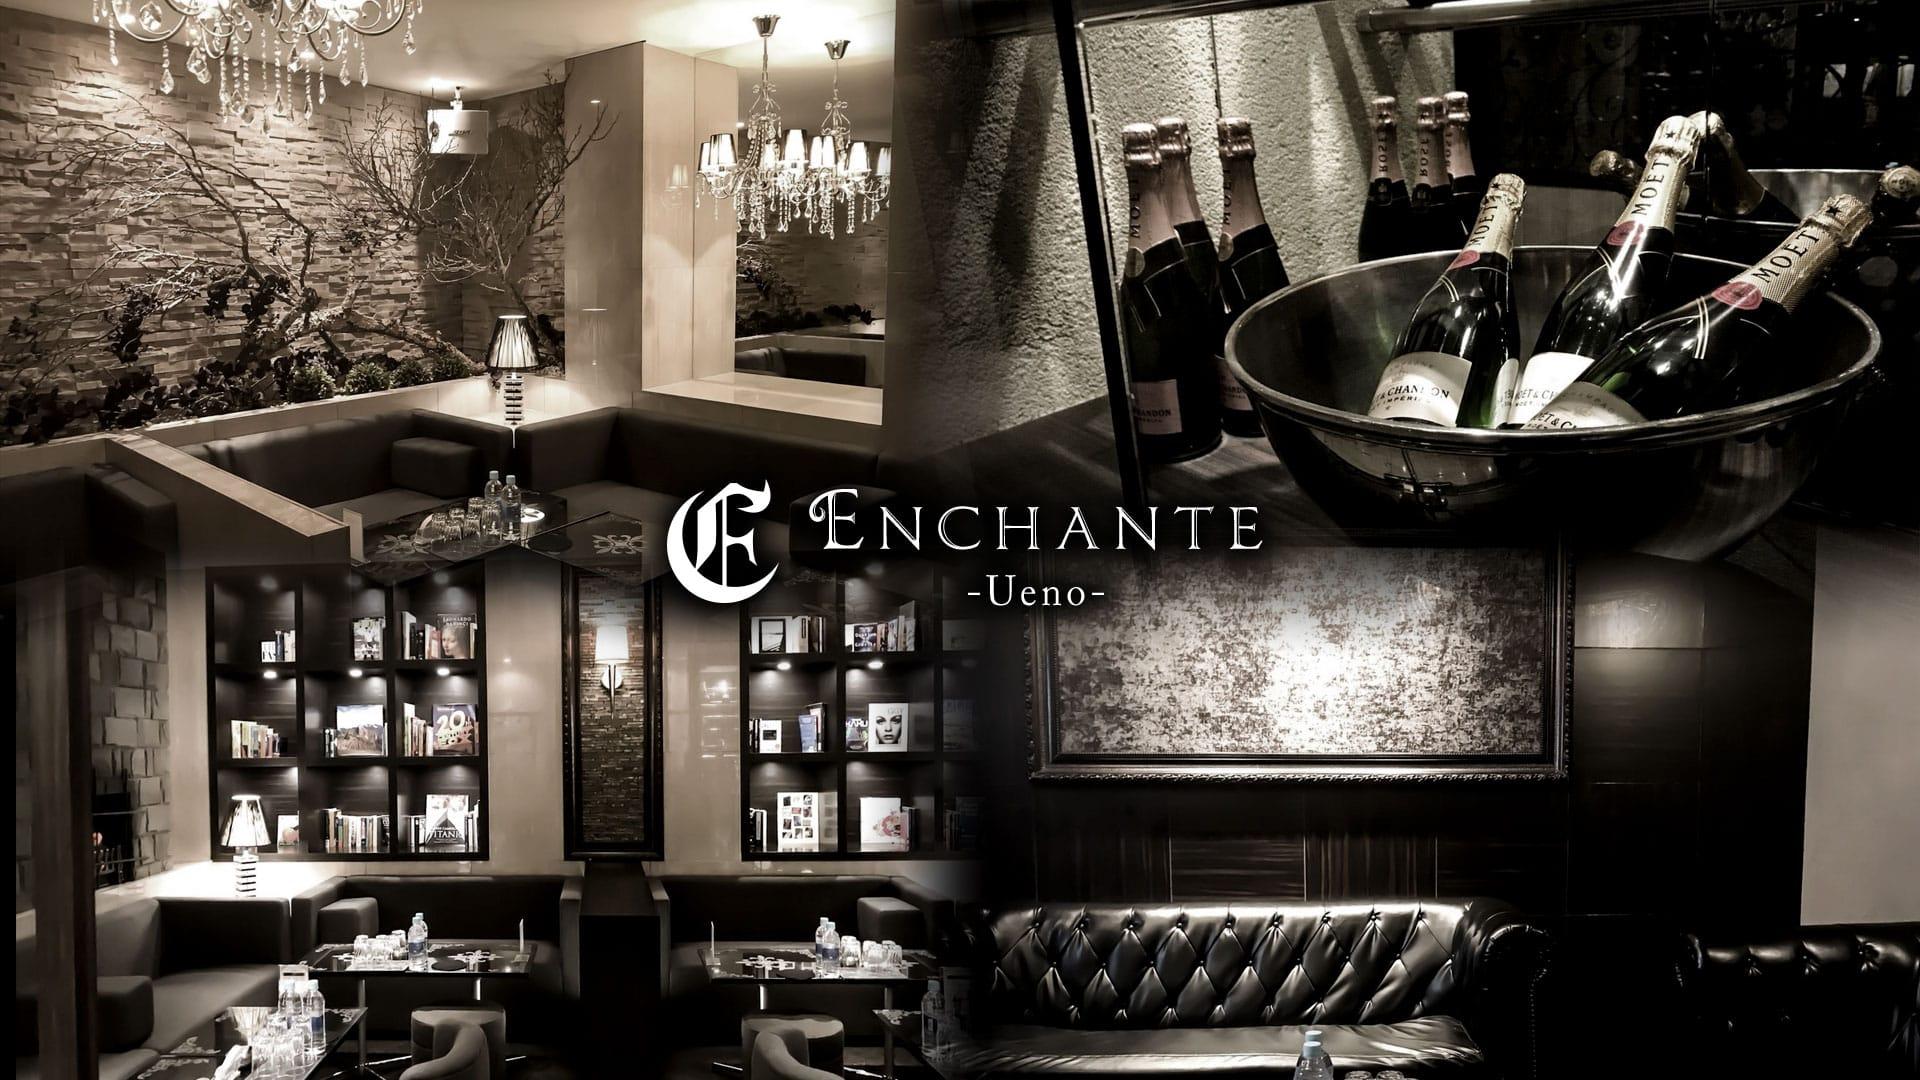 ENCHANTE-UENO-[アンシャンテ] TOP画像